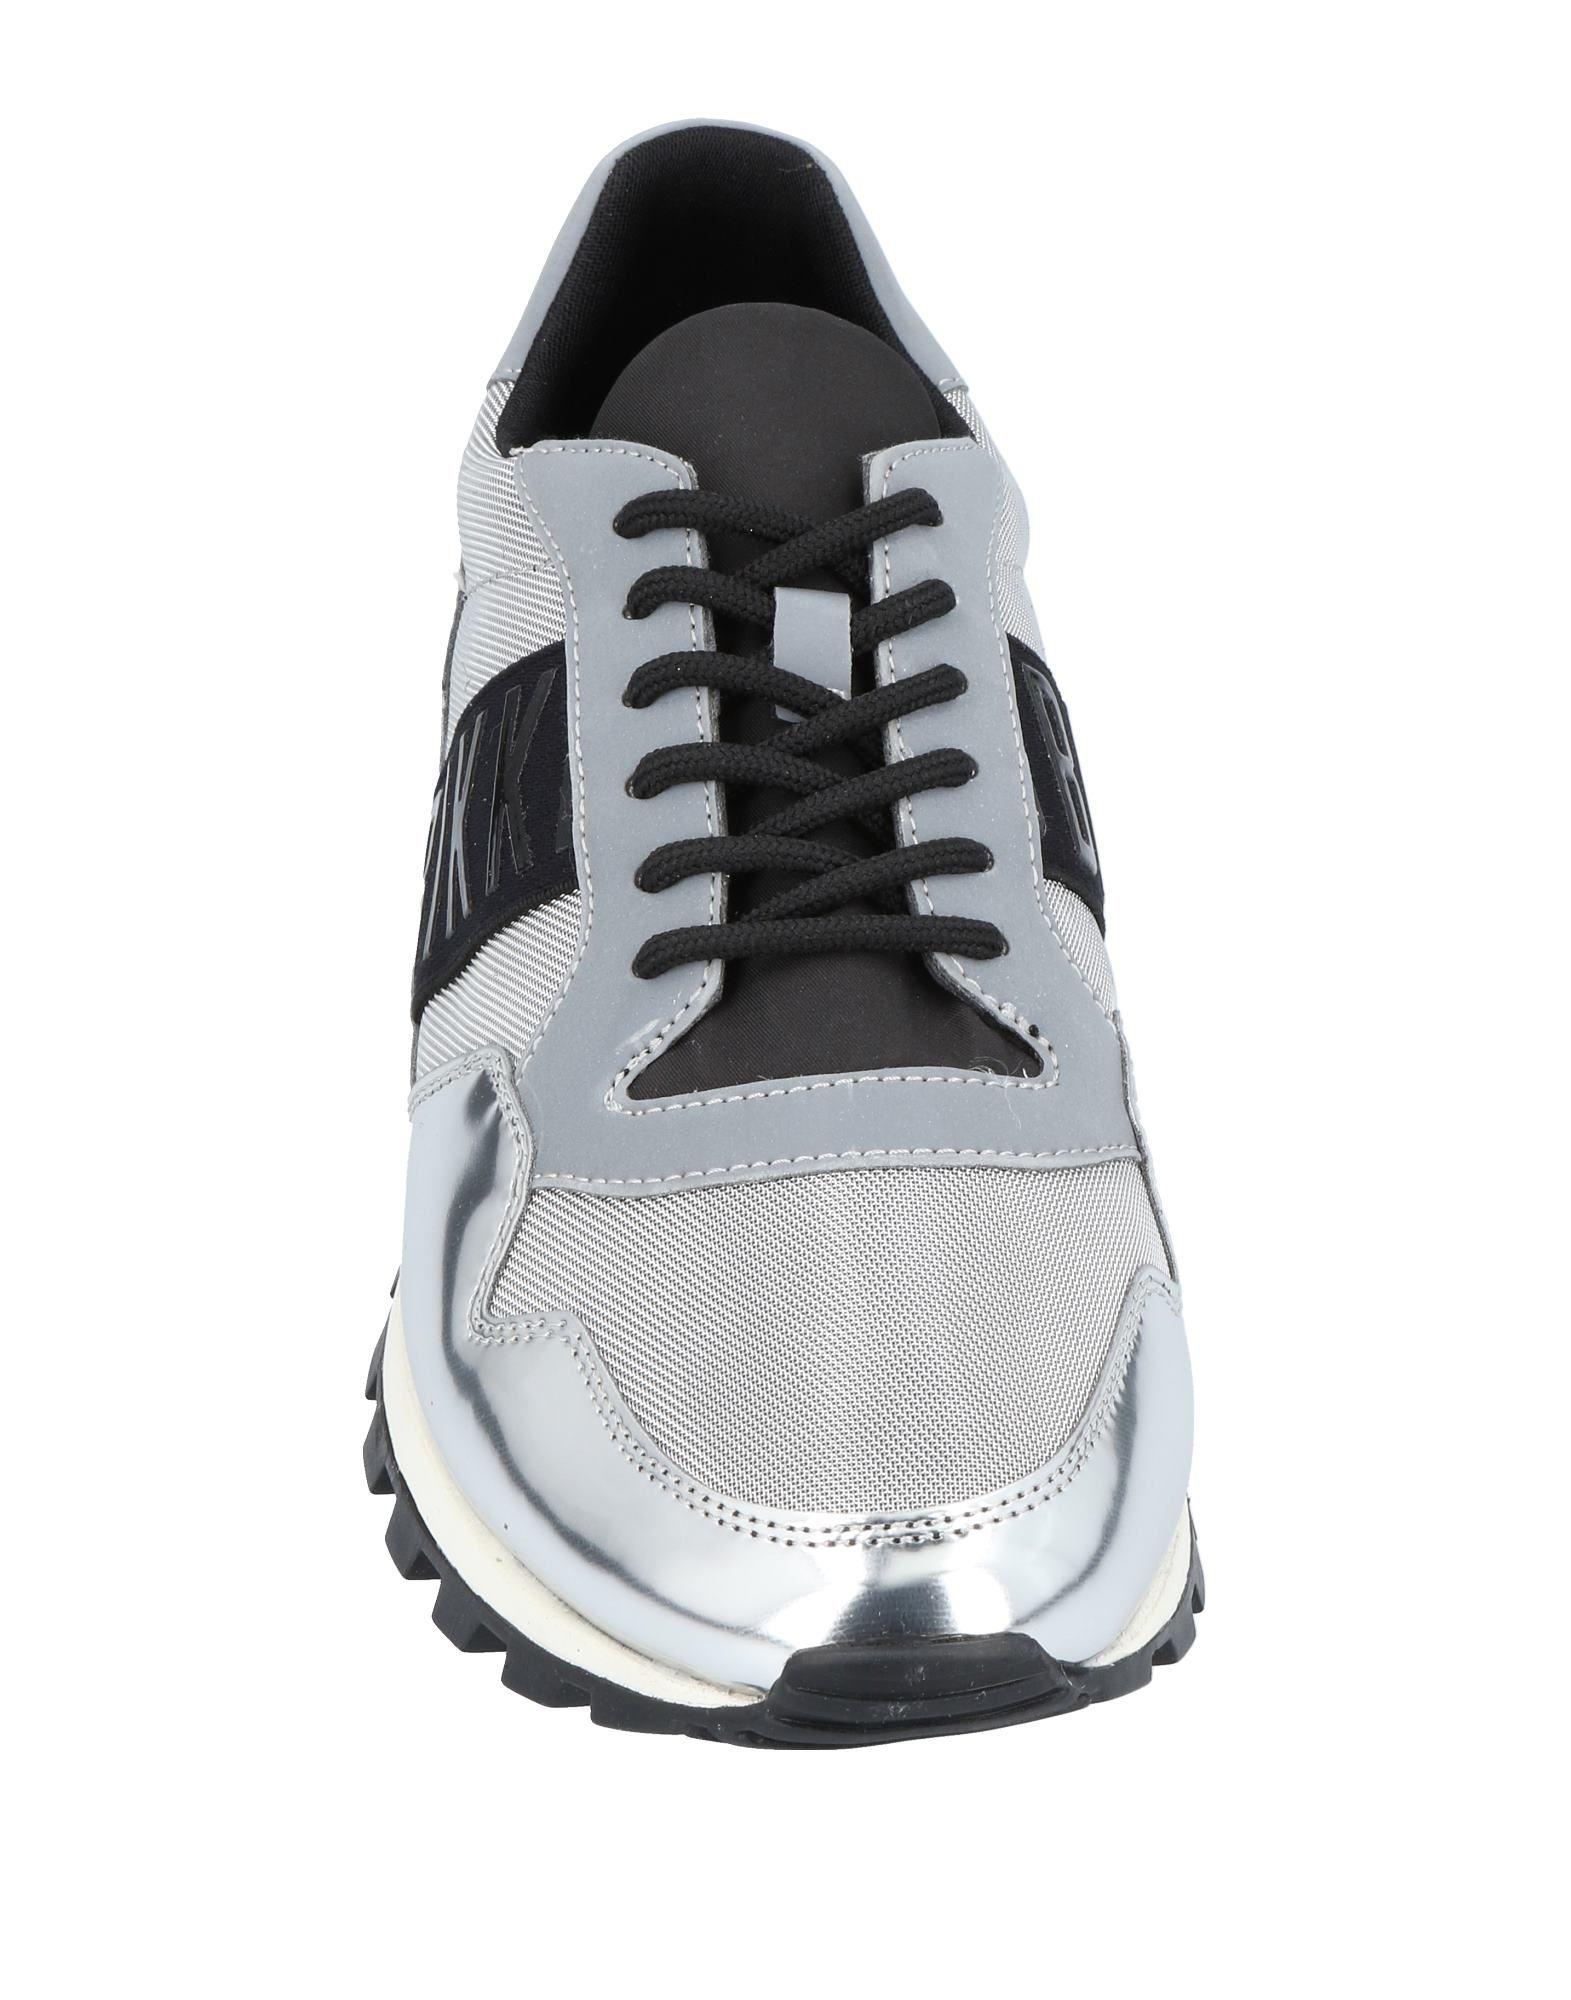 Bikkembergs Sneakers Herren  11449908AG Gute Qualität beliebte Schuhe